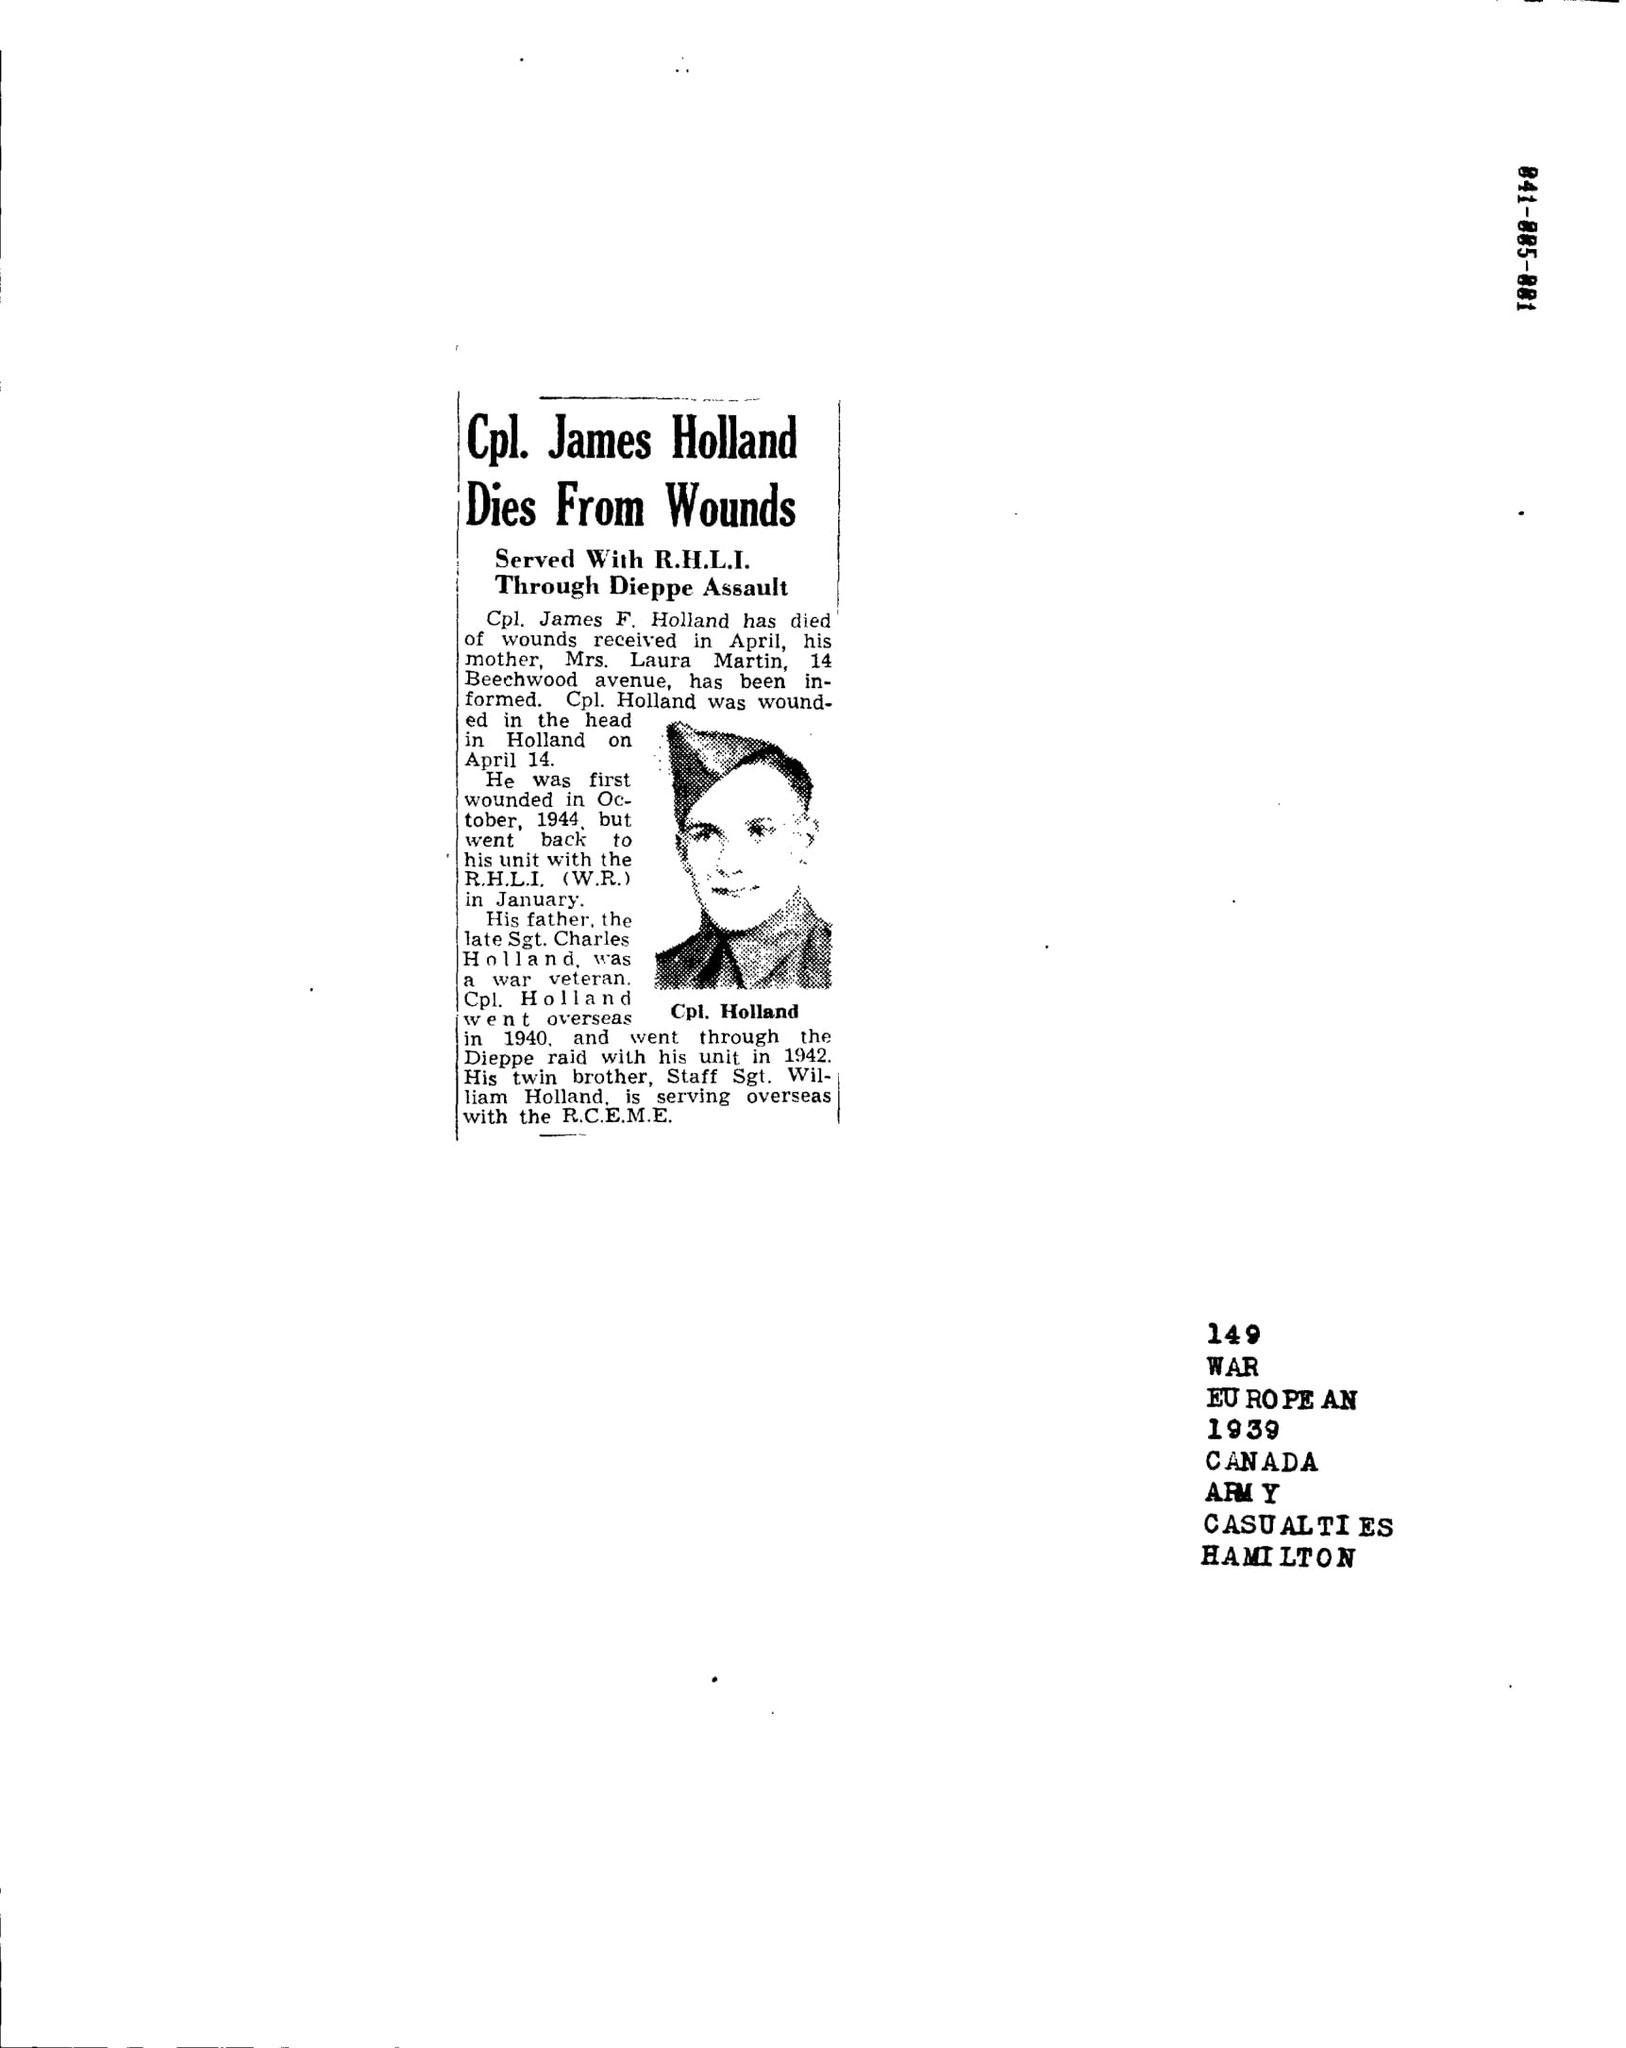 Hamilton Spectator 28-5-1945